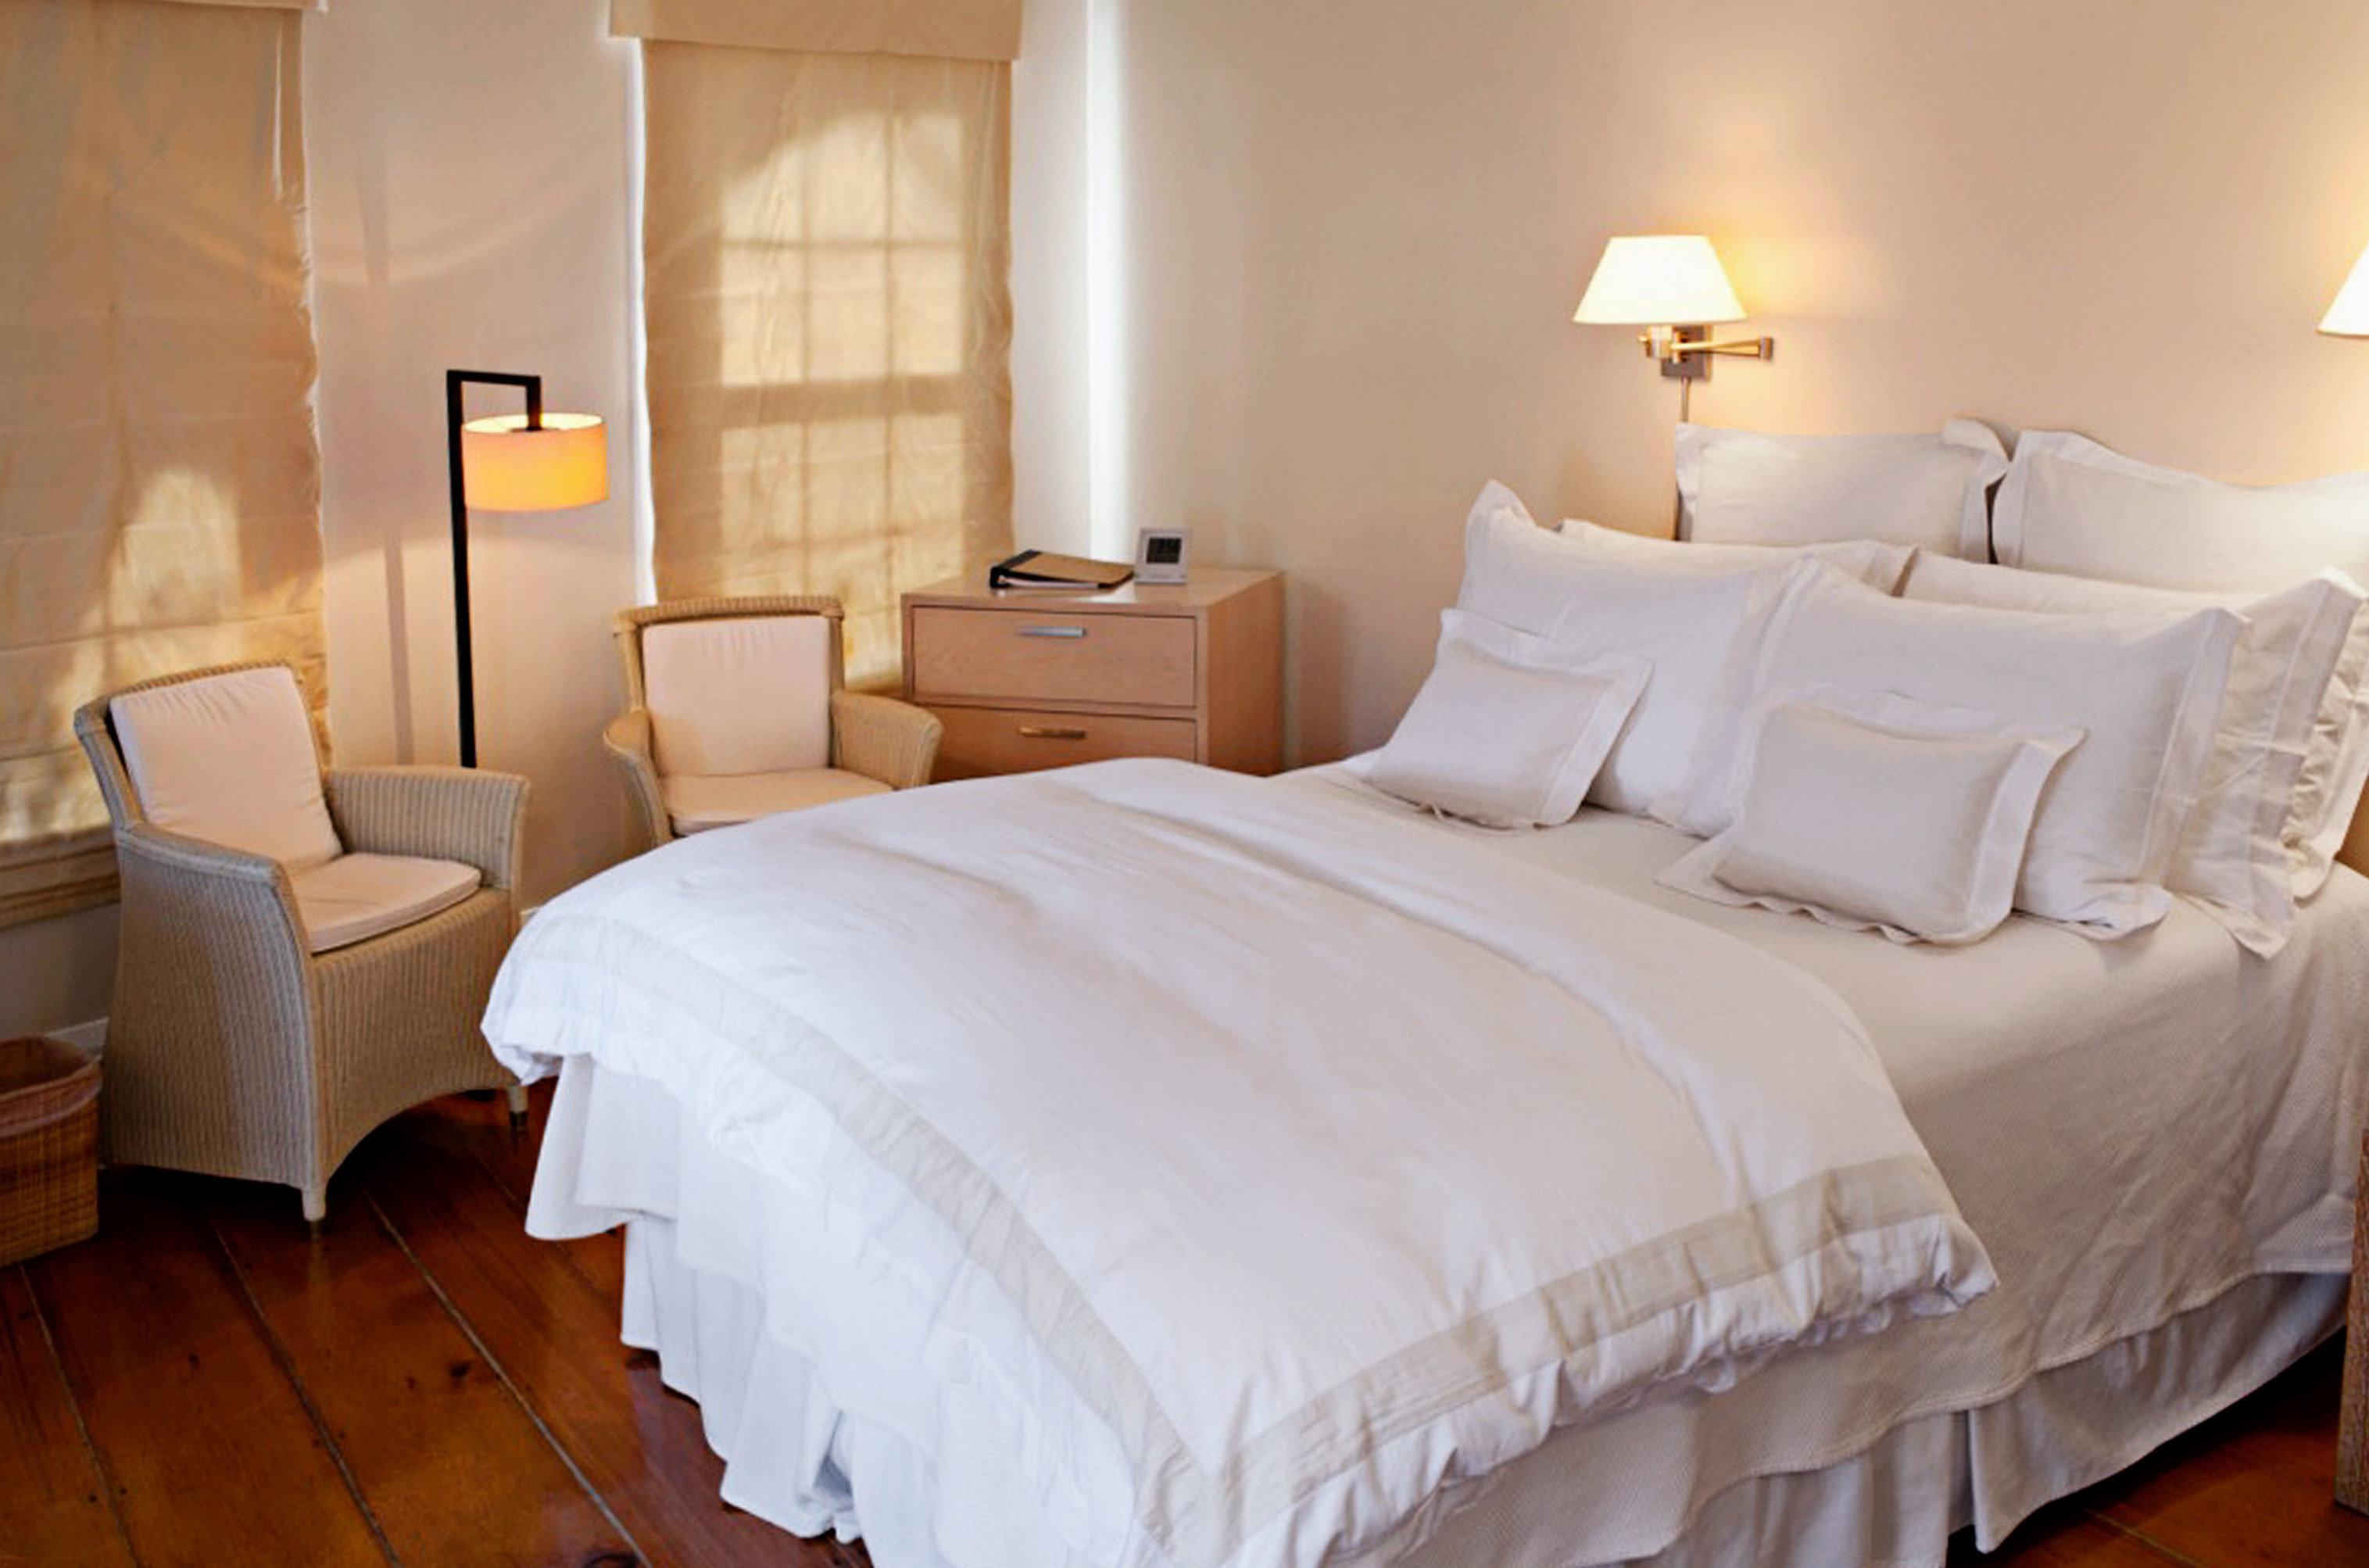 Bedroom Boutique Budget Suite bed sheet cottage night